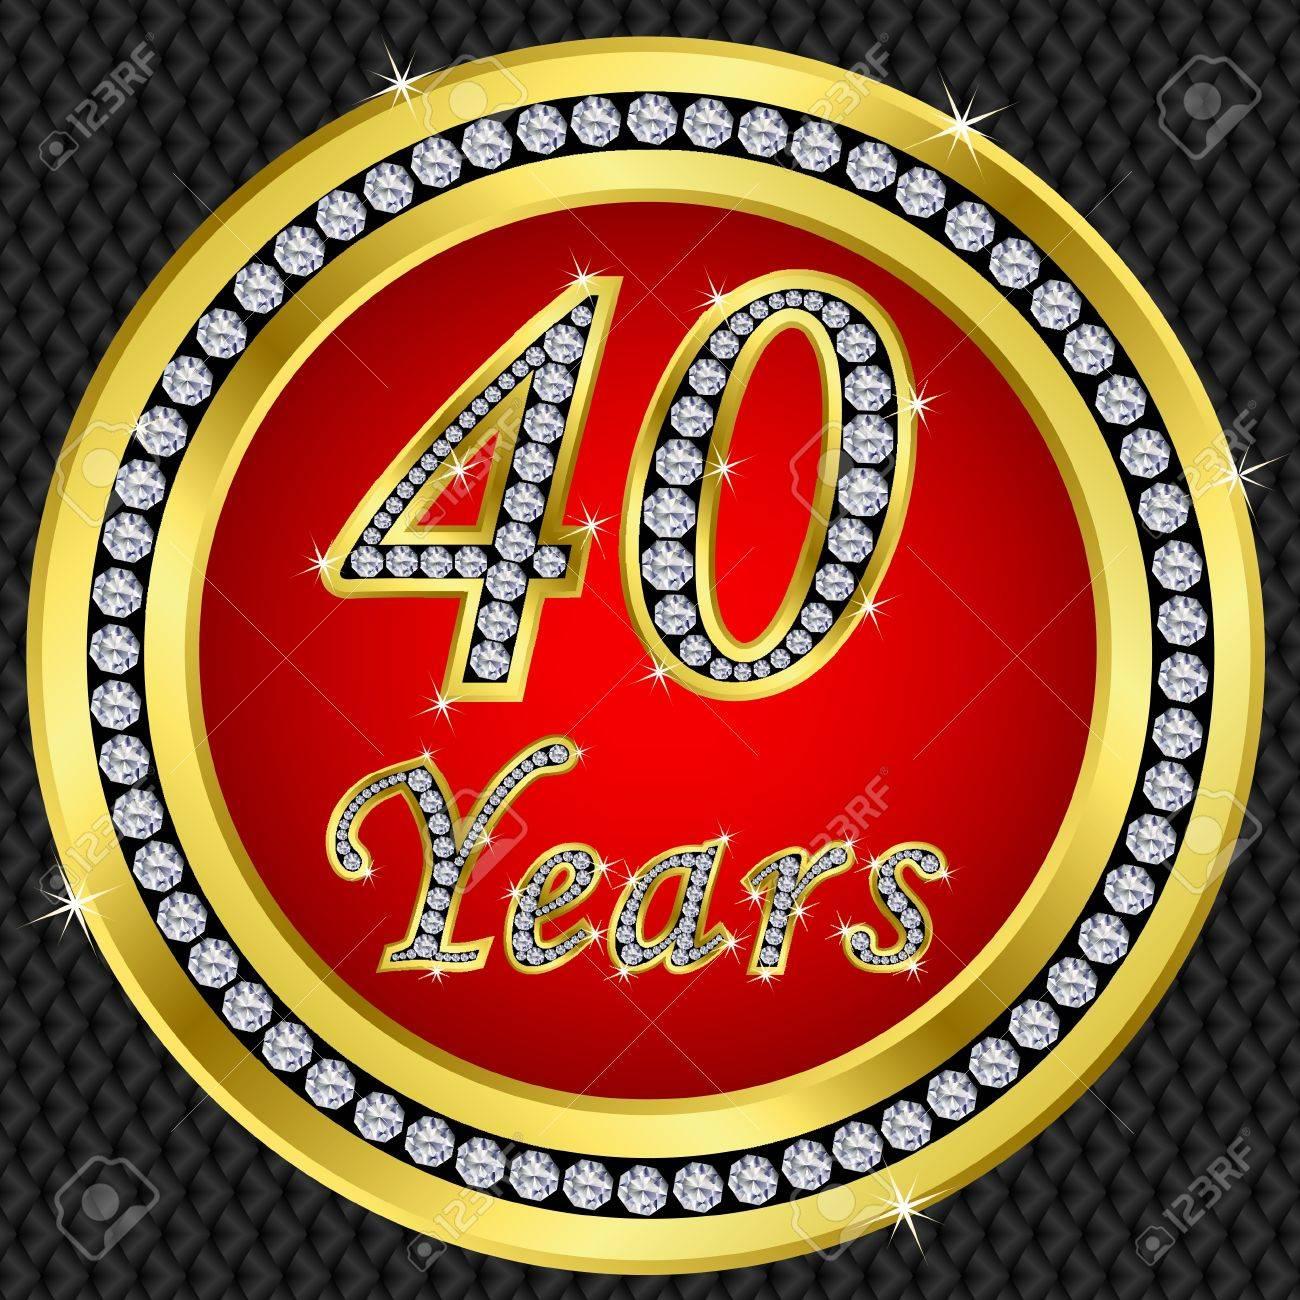 40 years anniversary golden icon with diamonds, vector illustration Stock Vector - 11659655